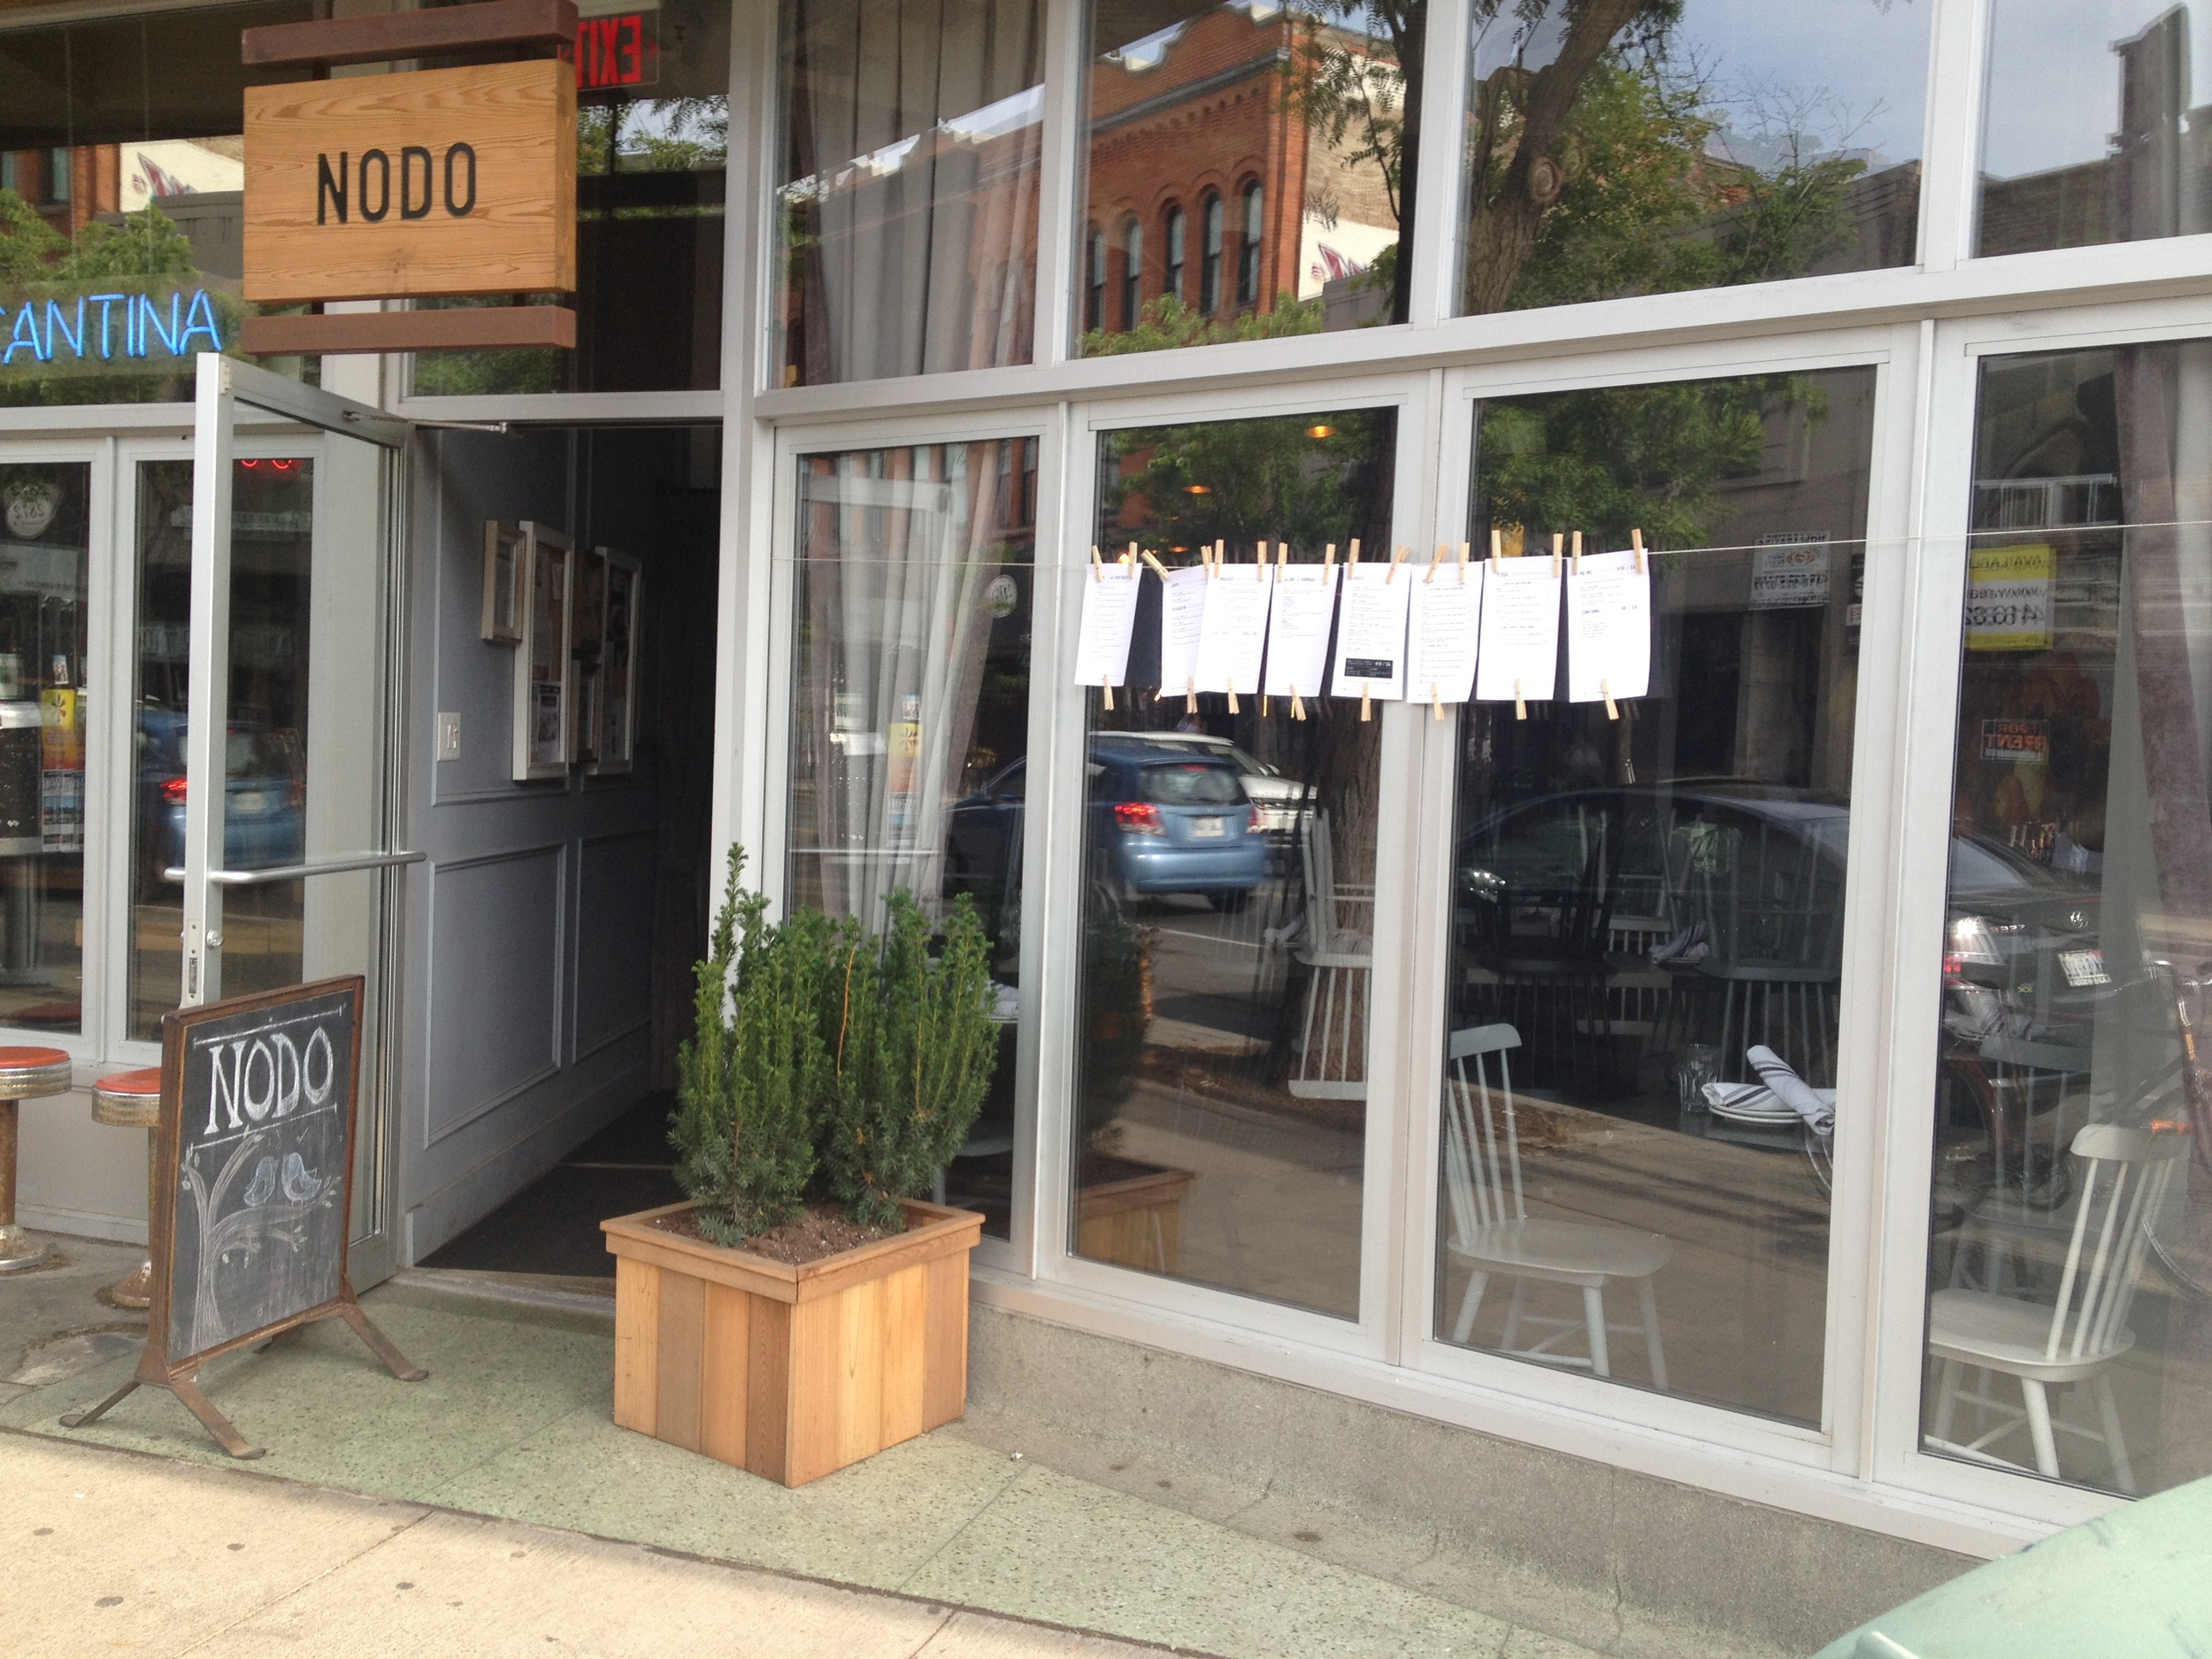 Nodo restaurant front